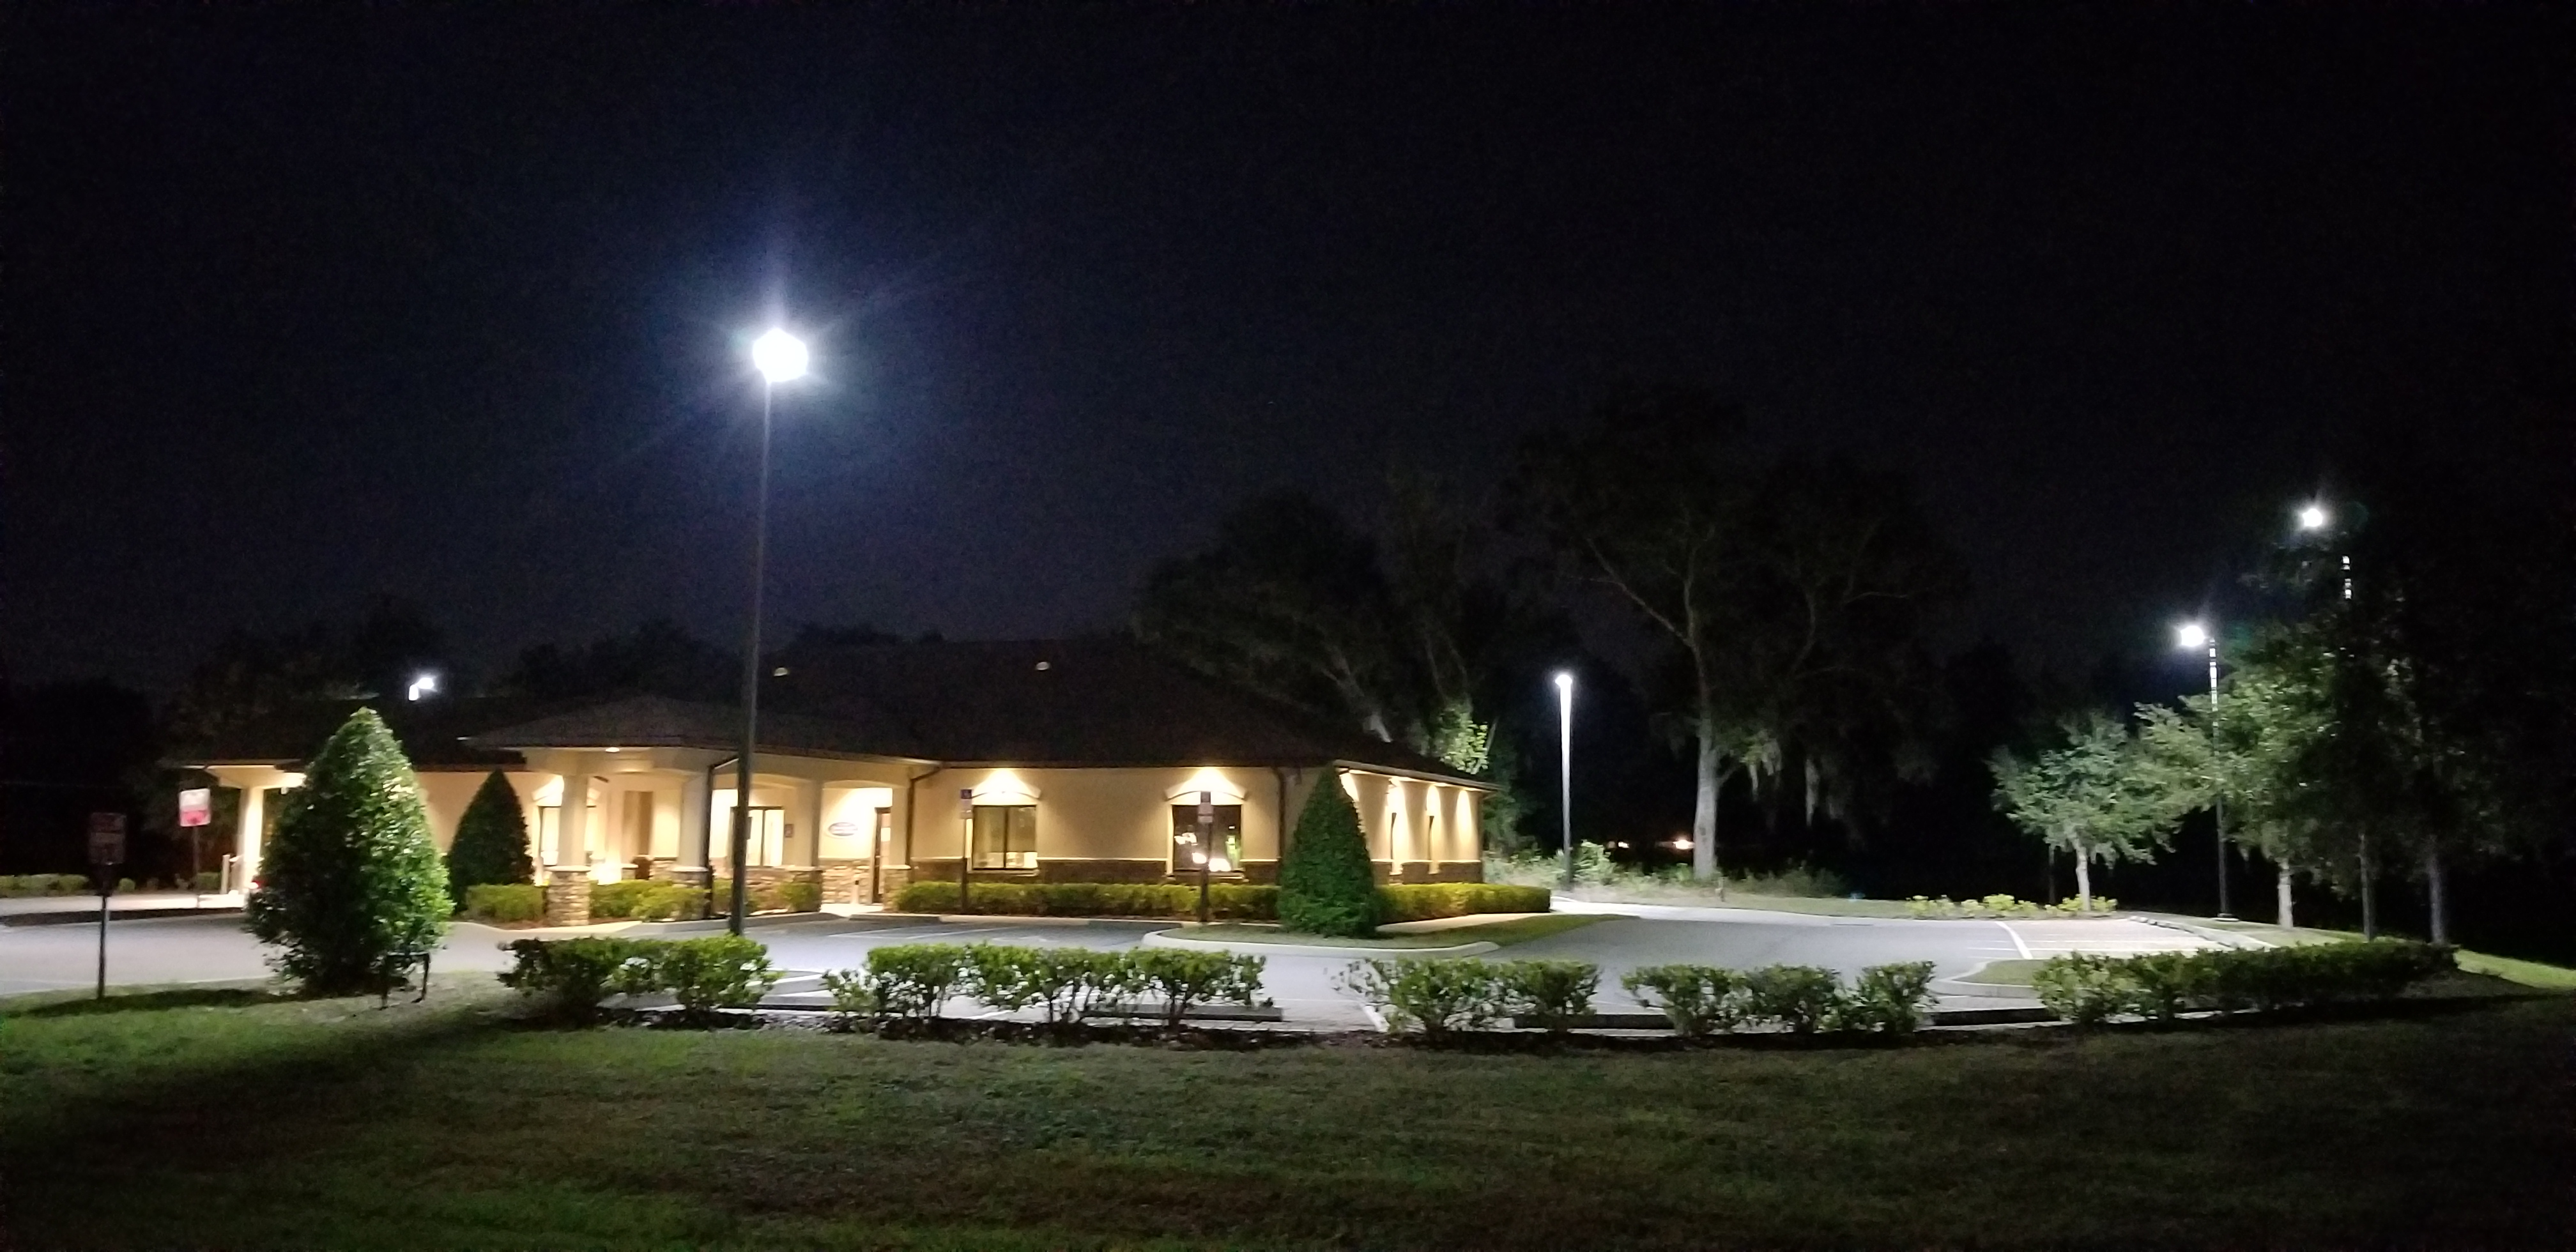 11-21-2018 OCCU's new lights